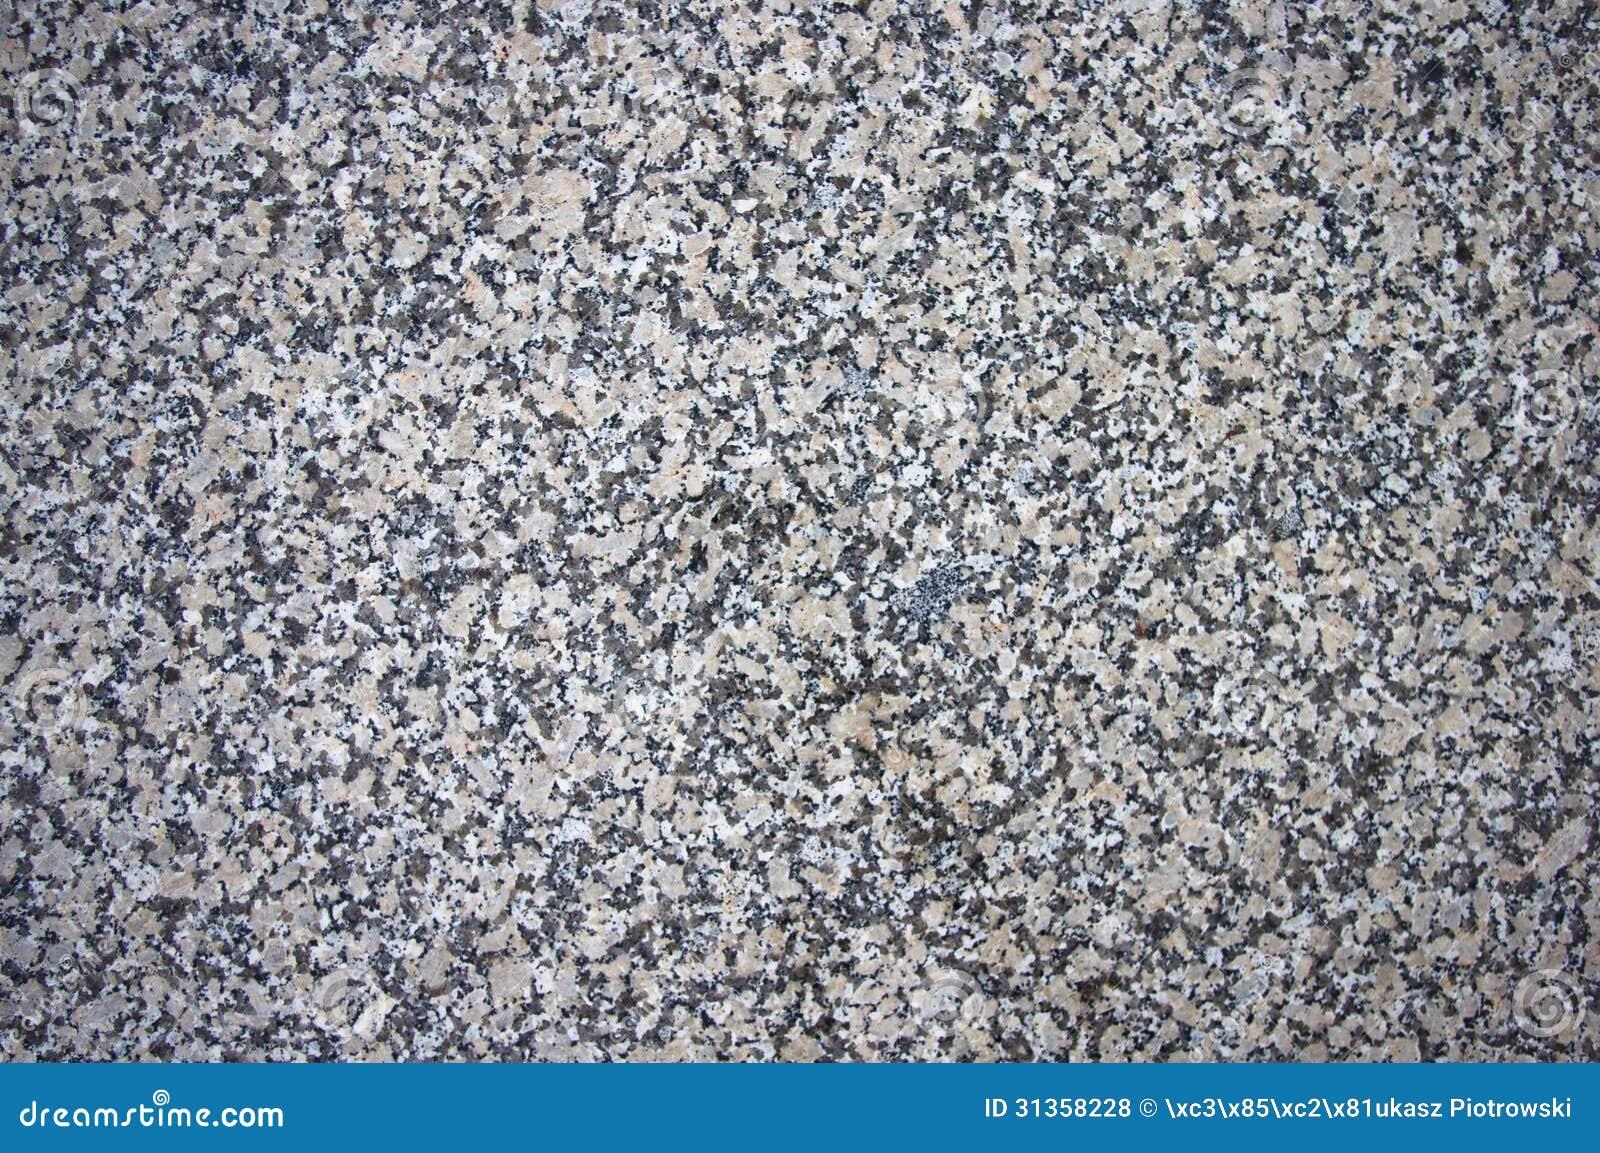 Natural Granite : Light Granite Stone Texture Royalty Free Stock Photos - Image ...